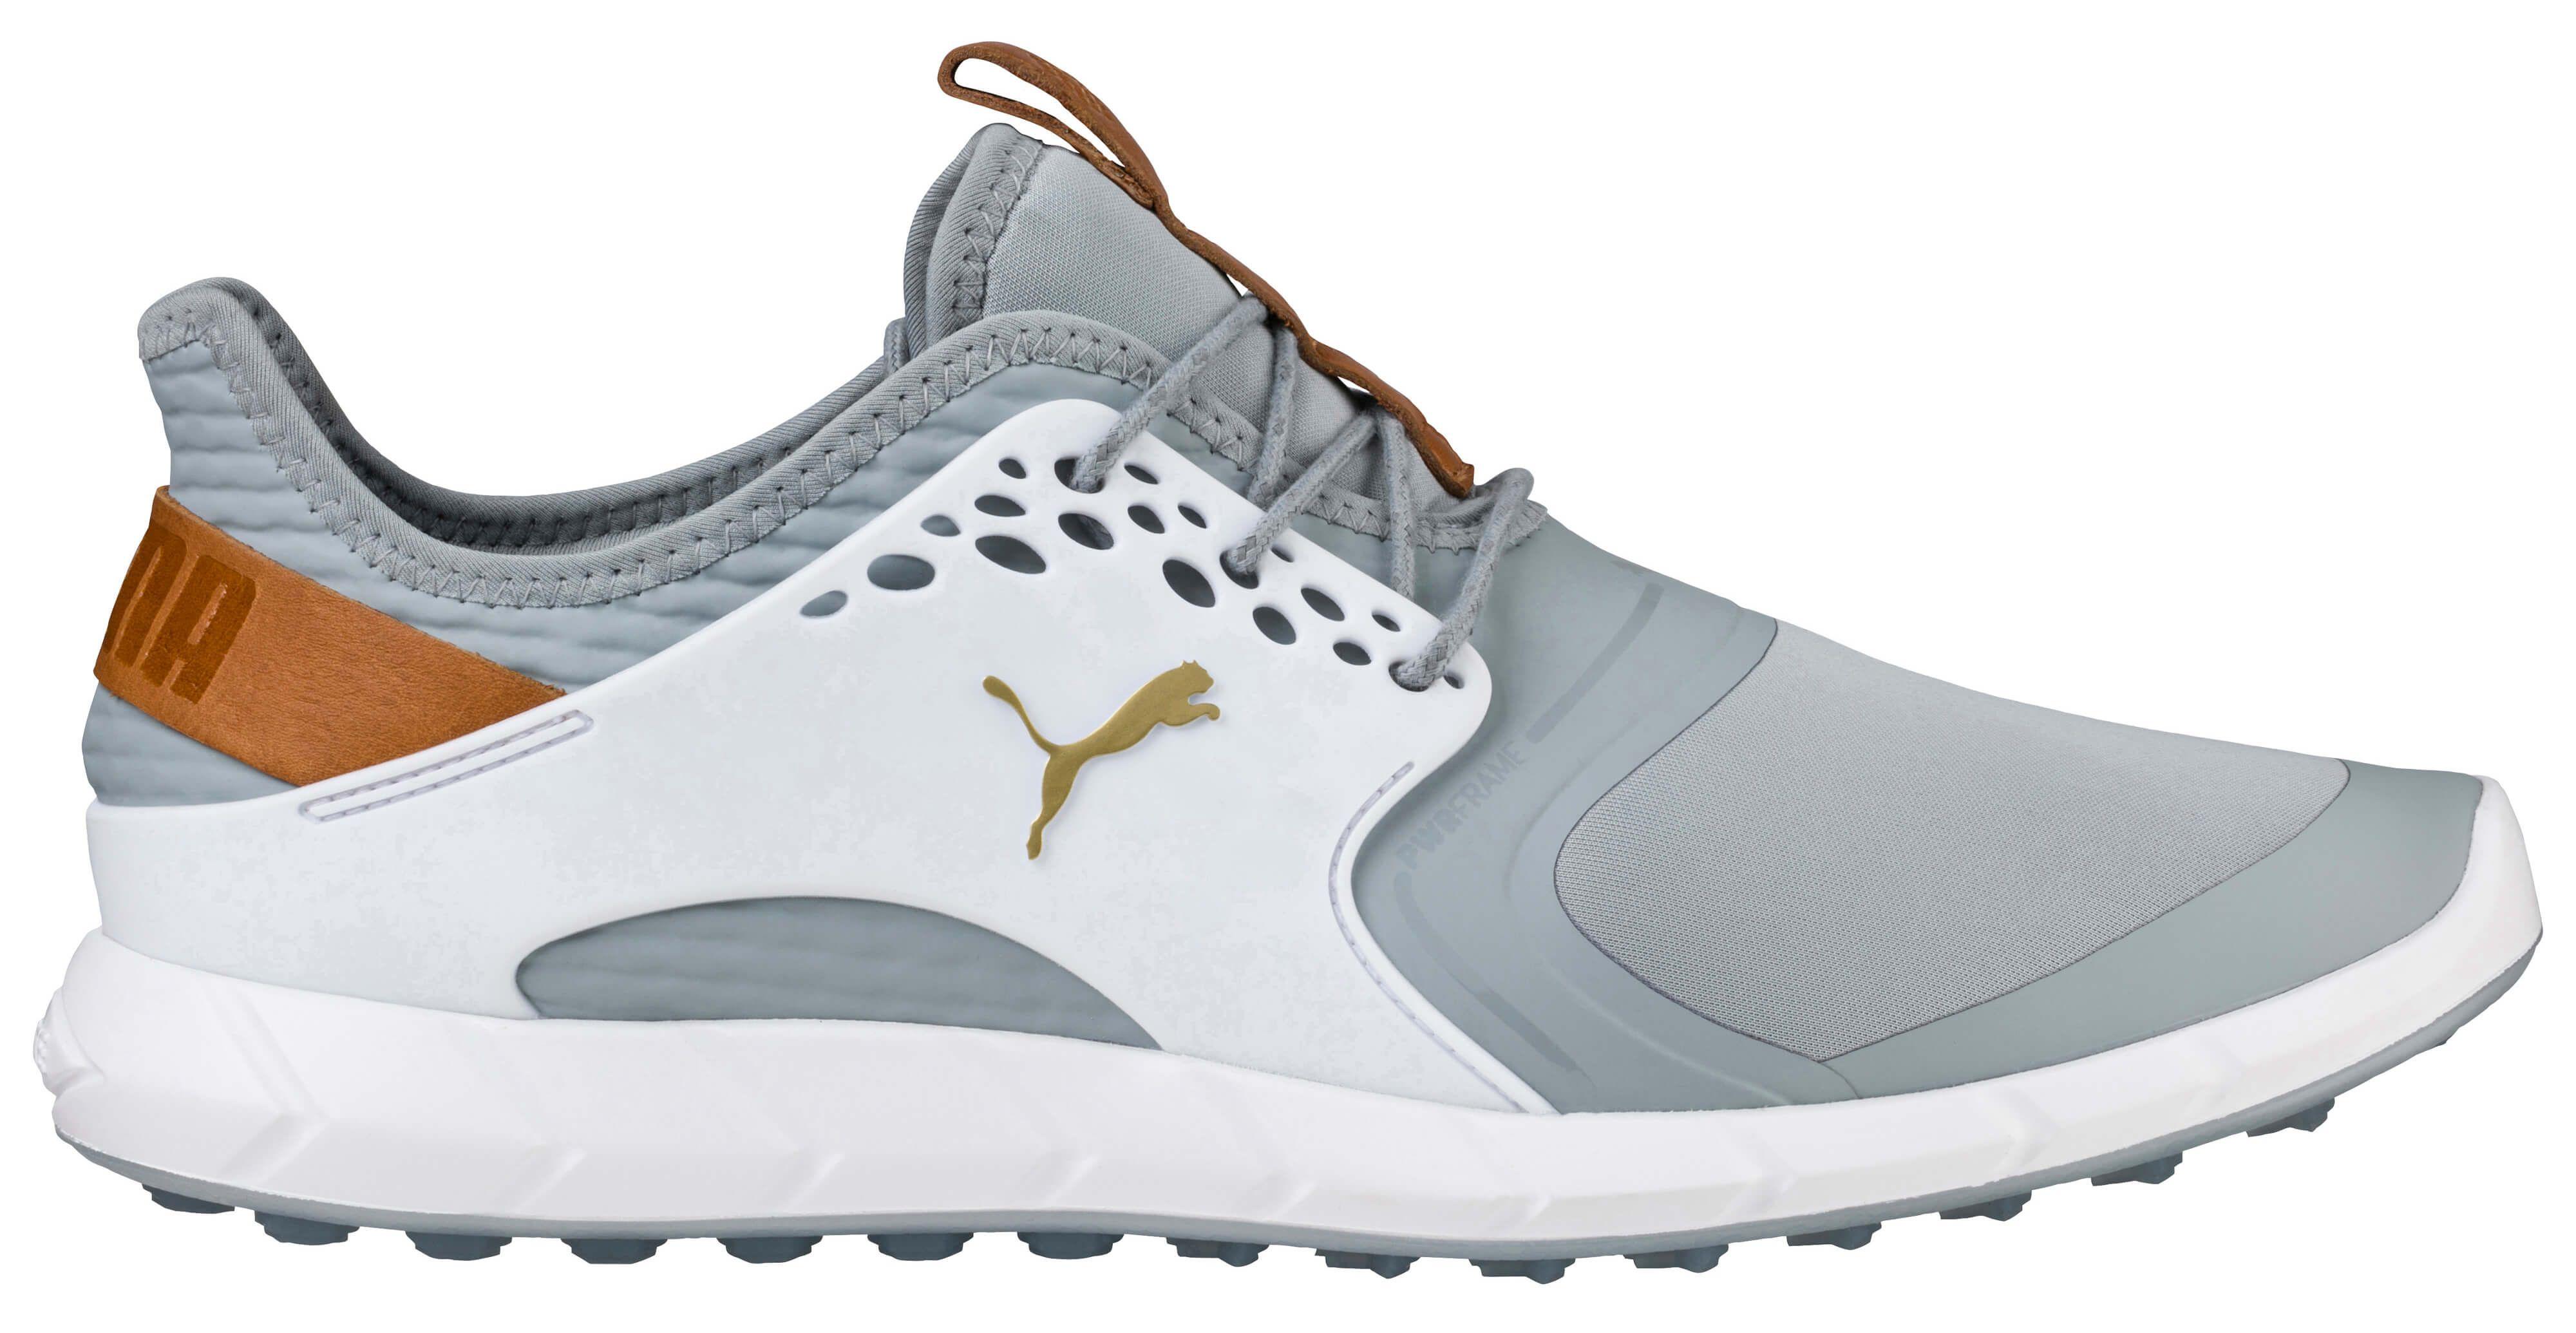 dd9c90c0fd86a1 Puma Ignite PWRSPORT Golf Shoes 190583 Men s New 2018 - Choose Color   Size ! Golf Shoes Puma